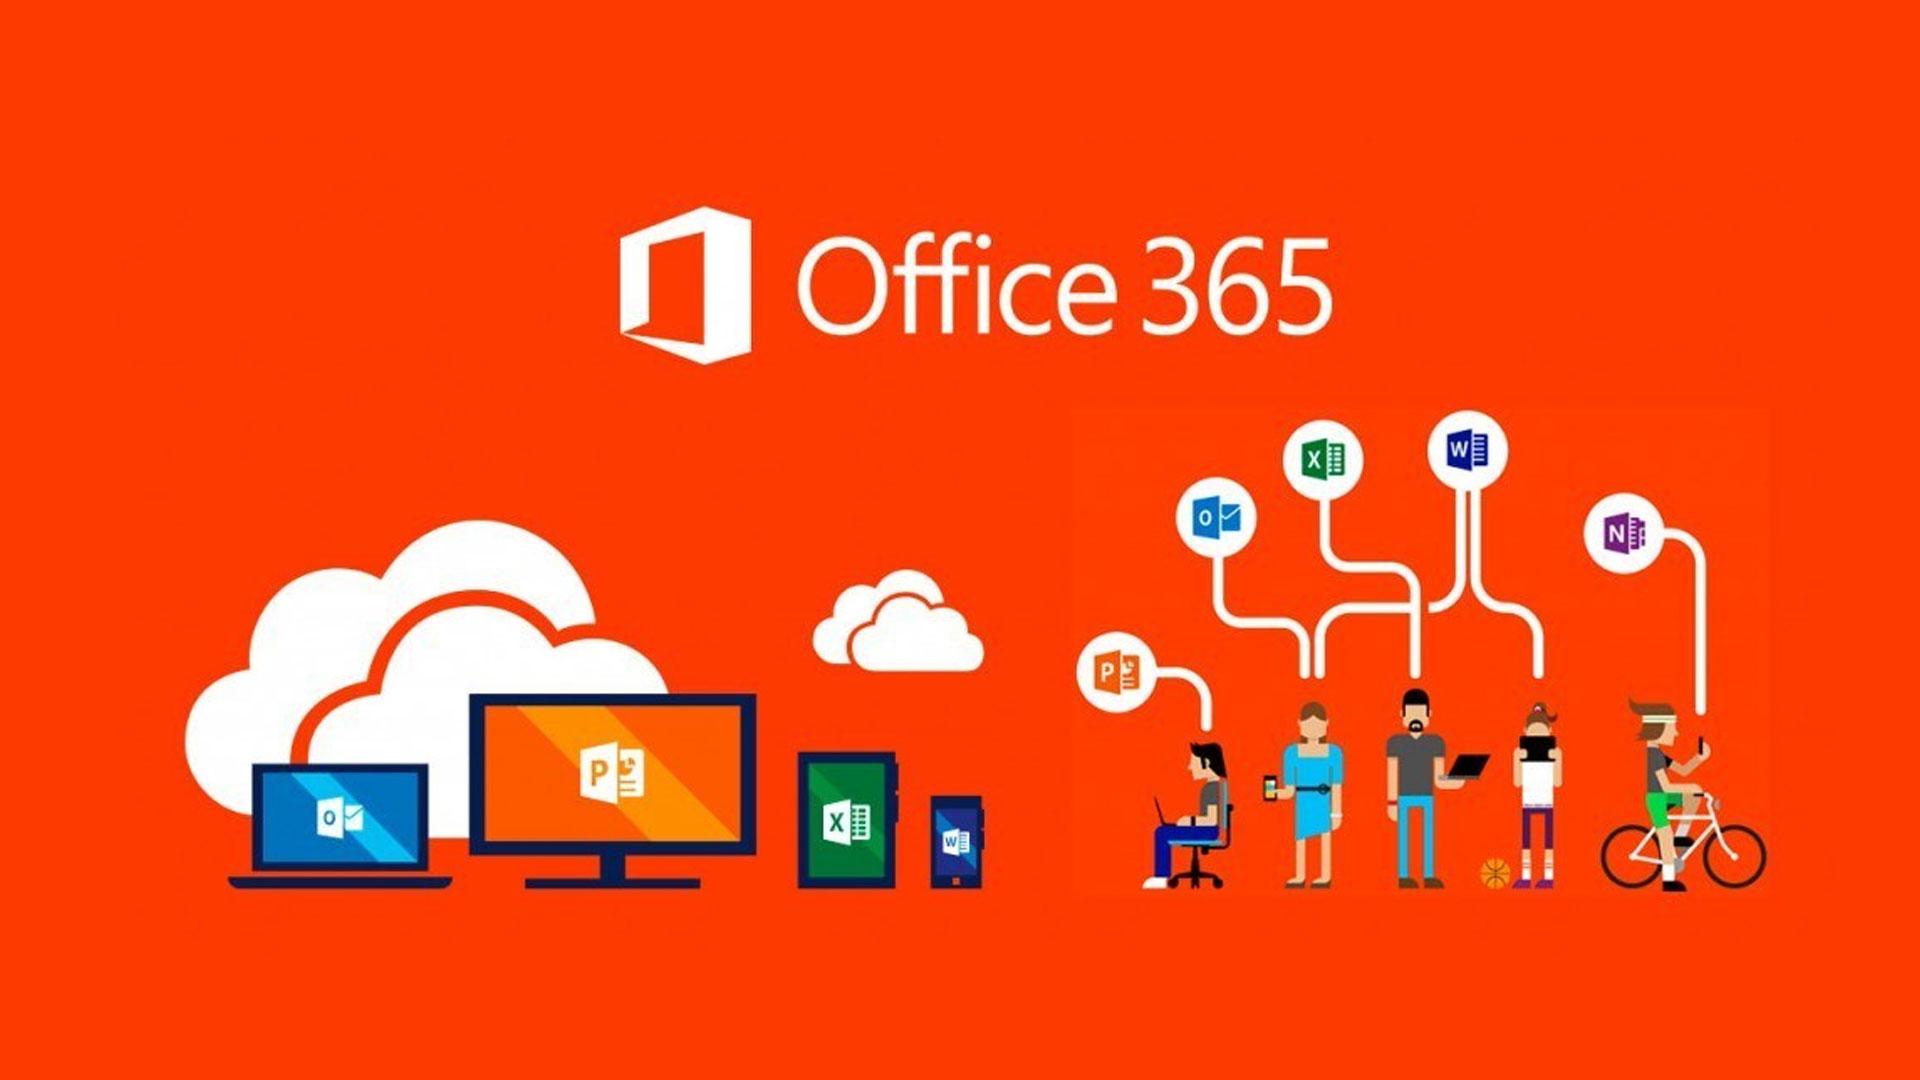 Aperiam - Microsoft 365 Identity Management